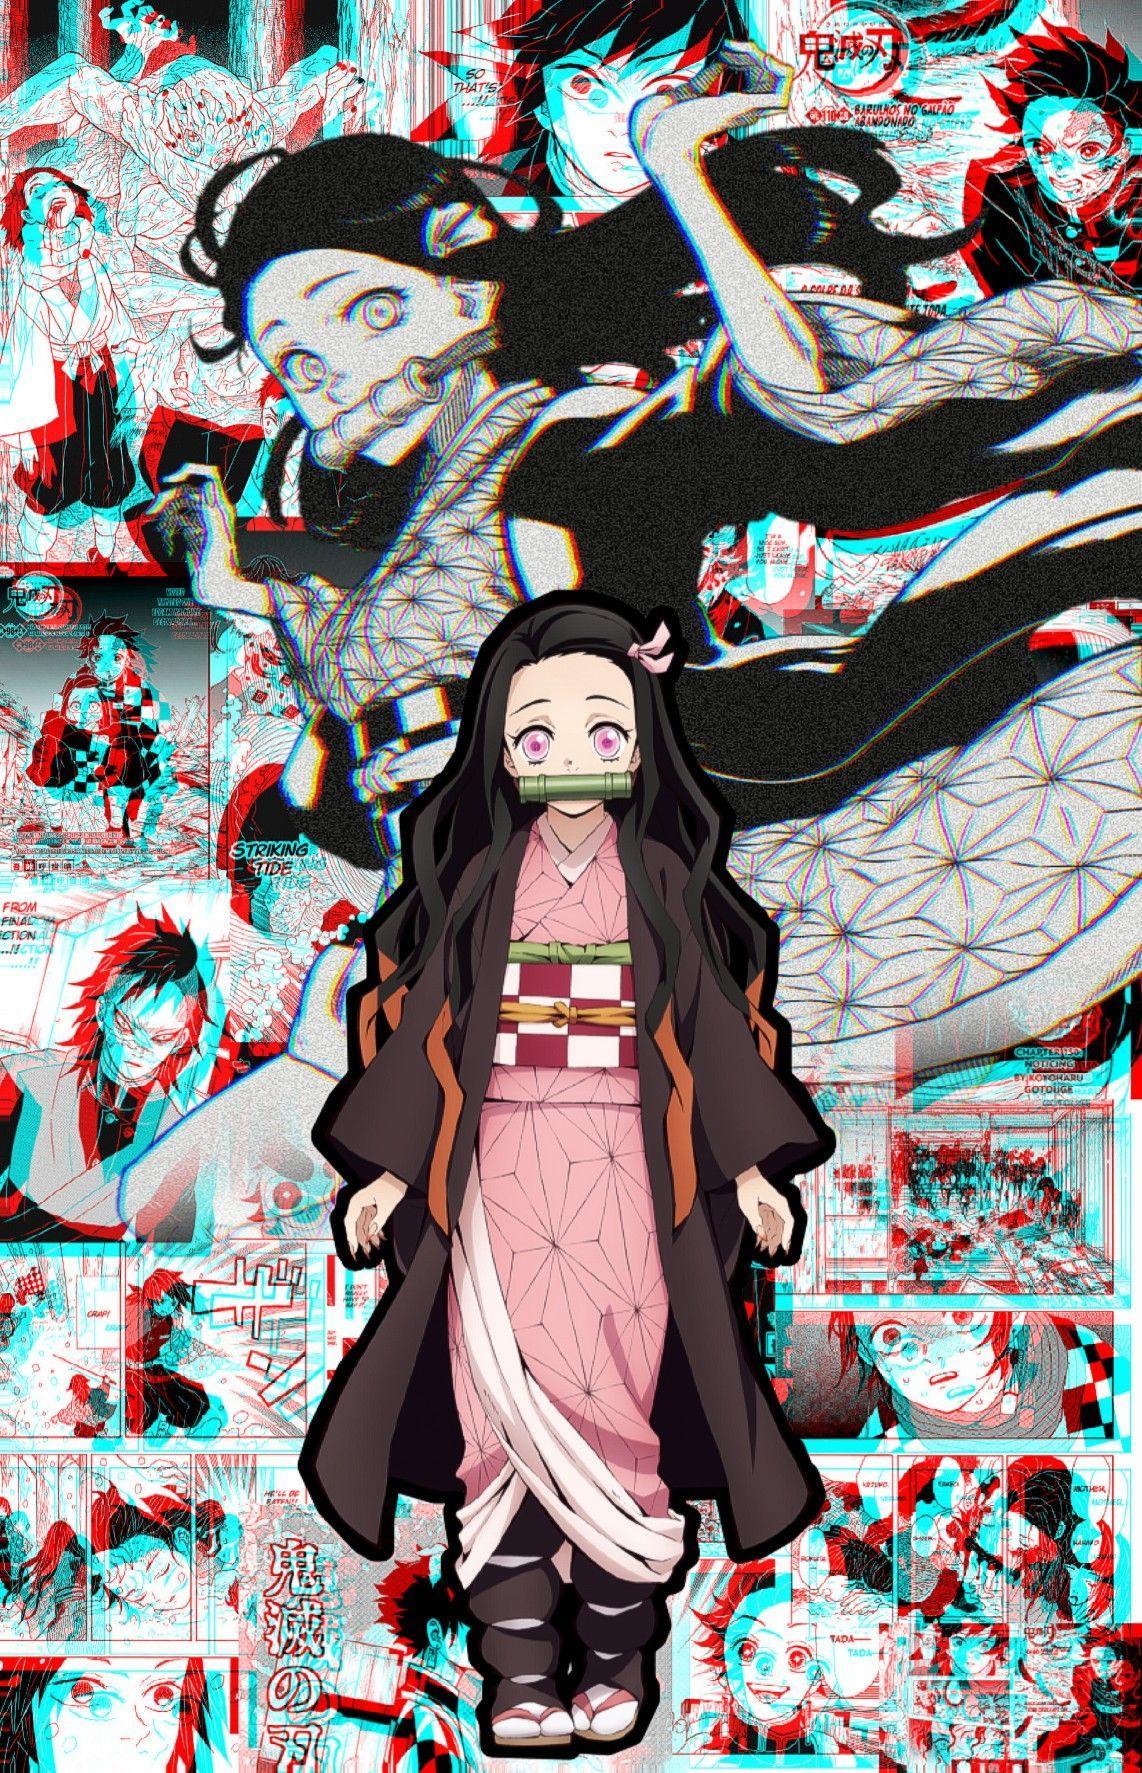 Demon Slayer Kimetsu No Yaiba Wallpapers Top Free Demon Slayer